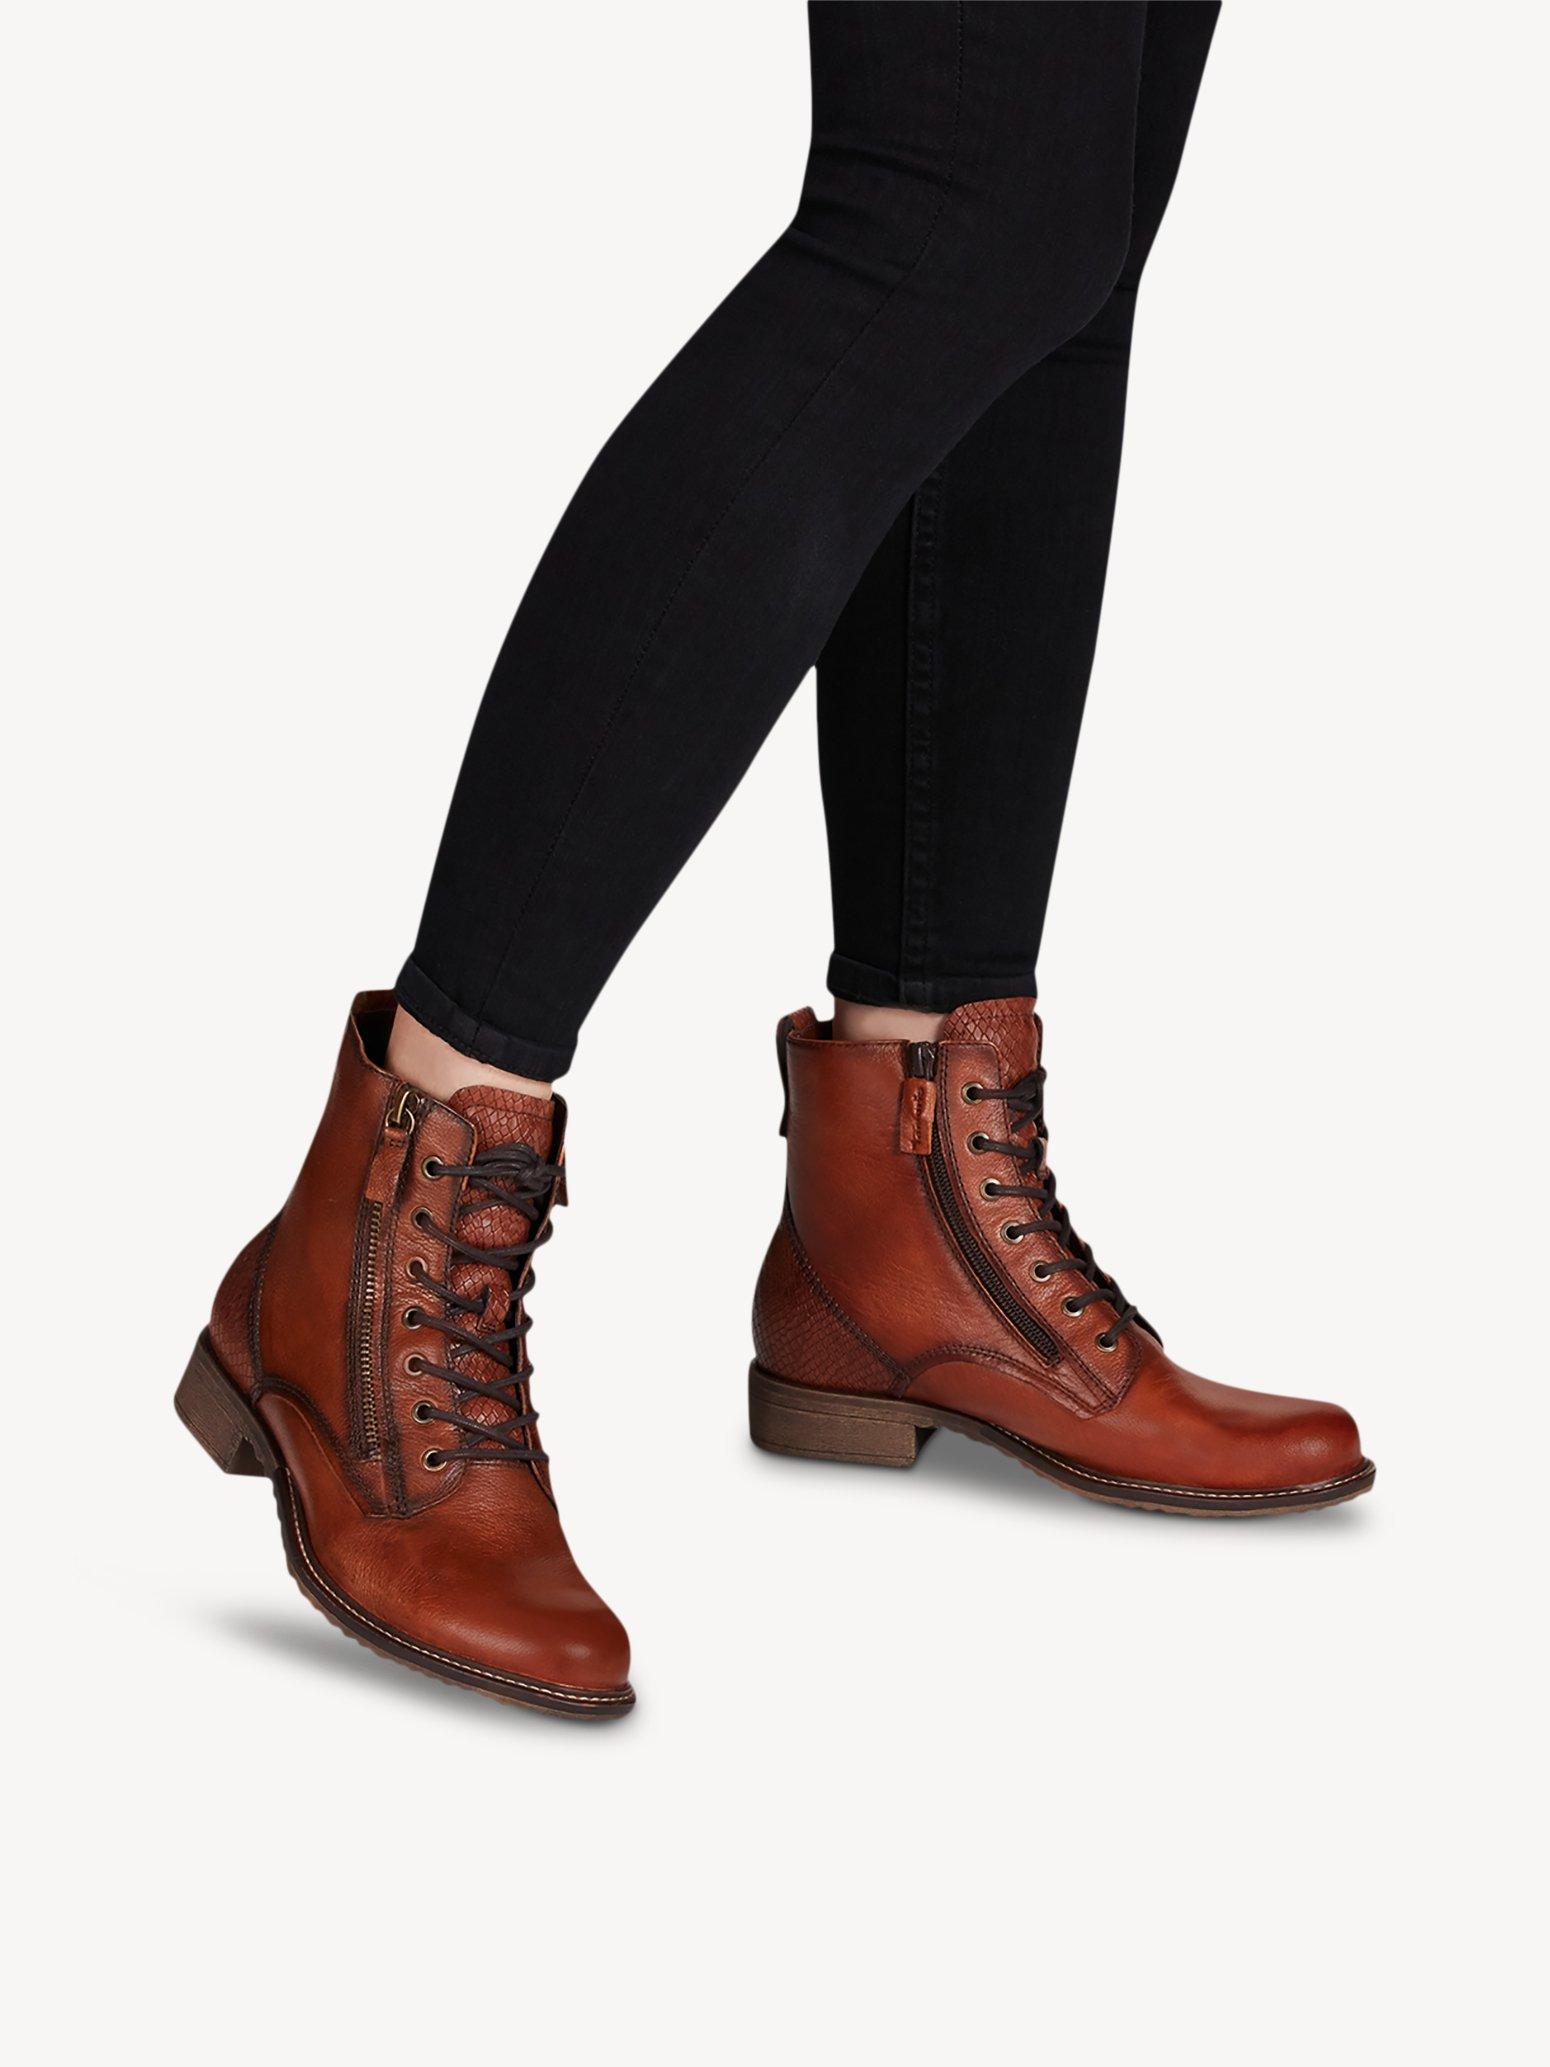 Ботинки Tamaris 1-1-25211-25-378